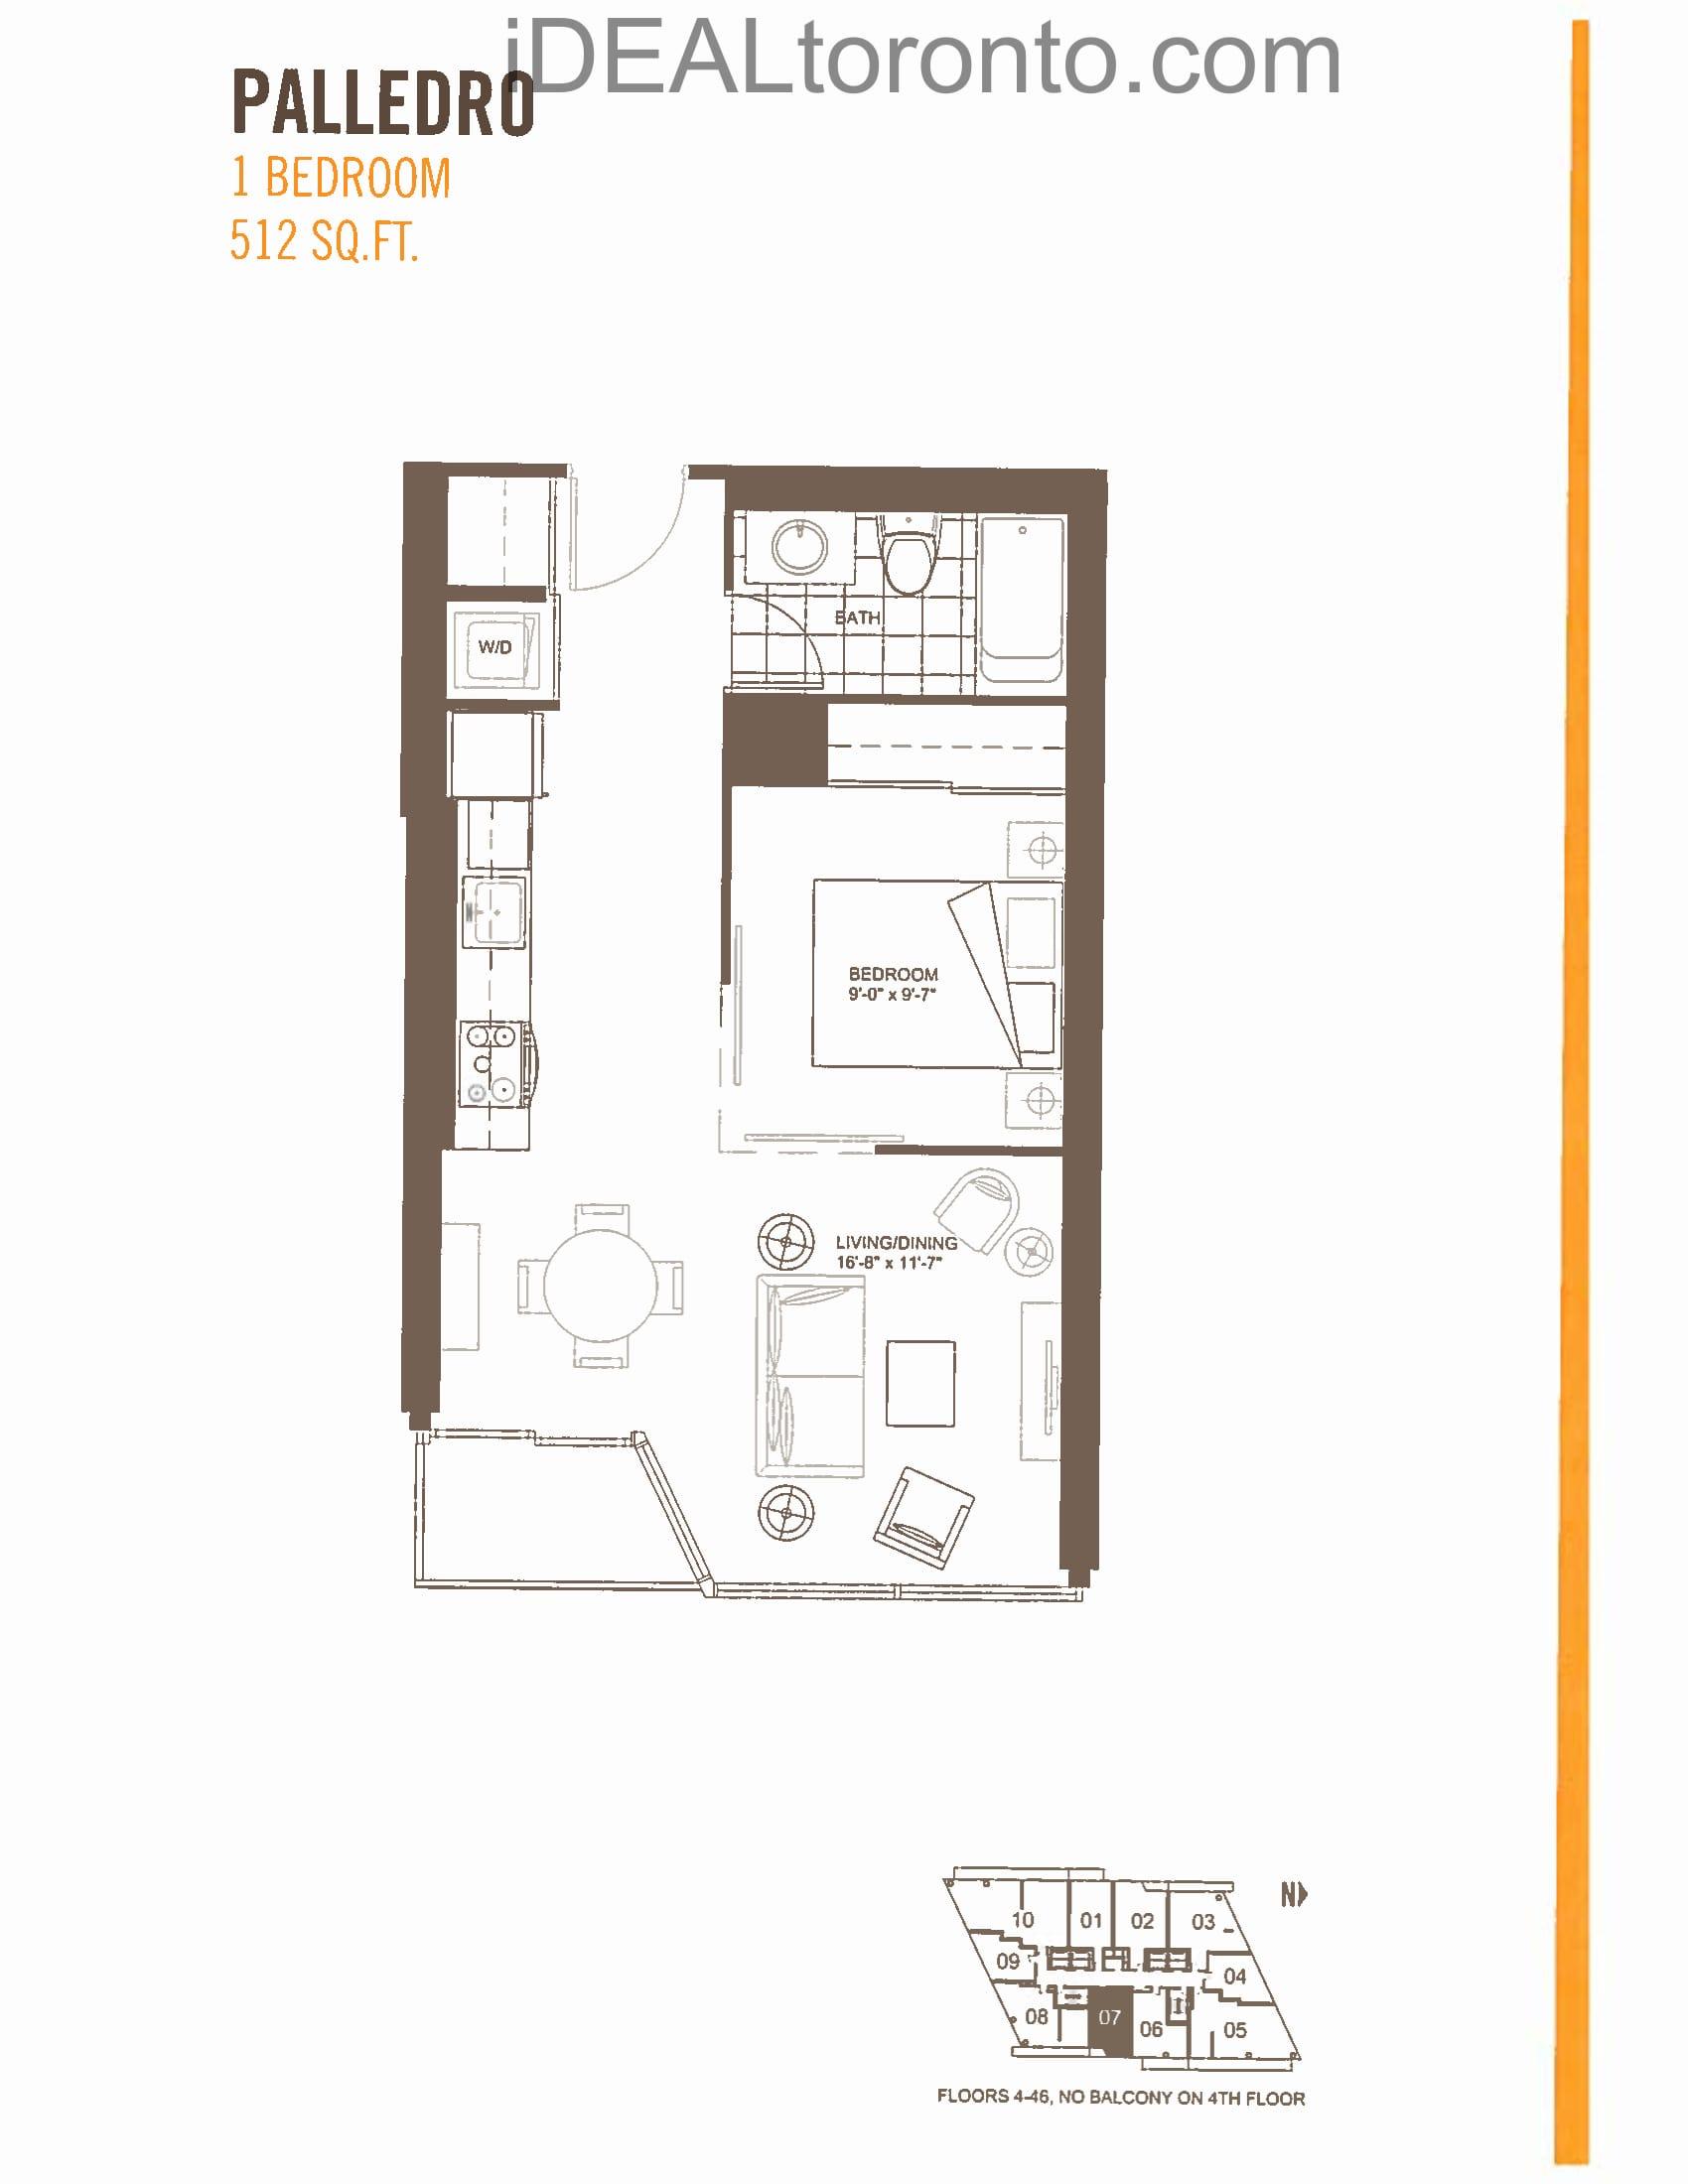 Palledro: 1 Bedroom,E, 512 SqFt